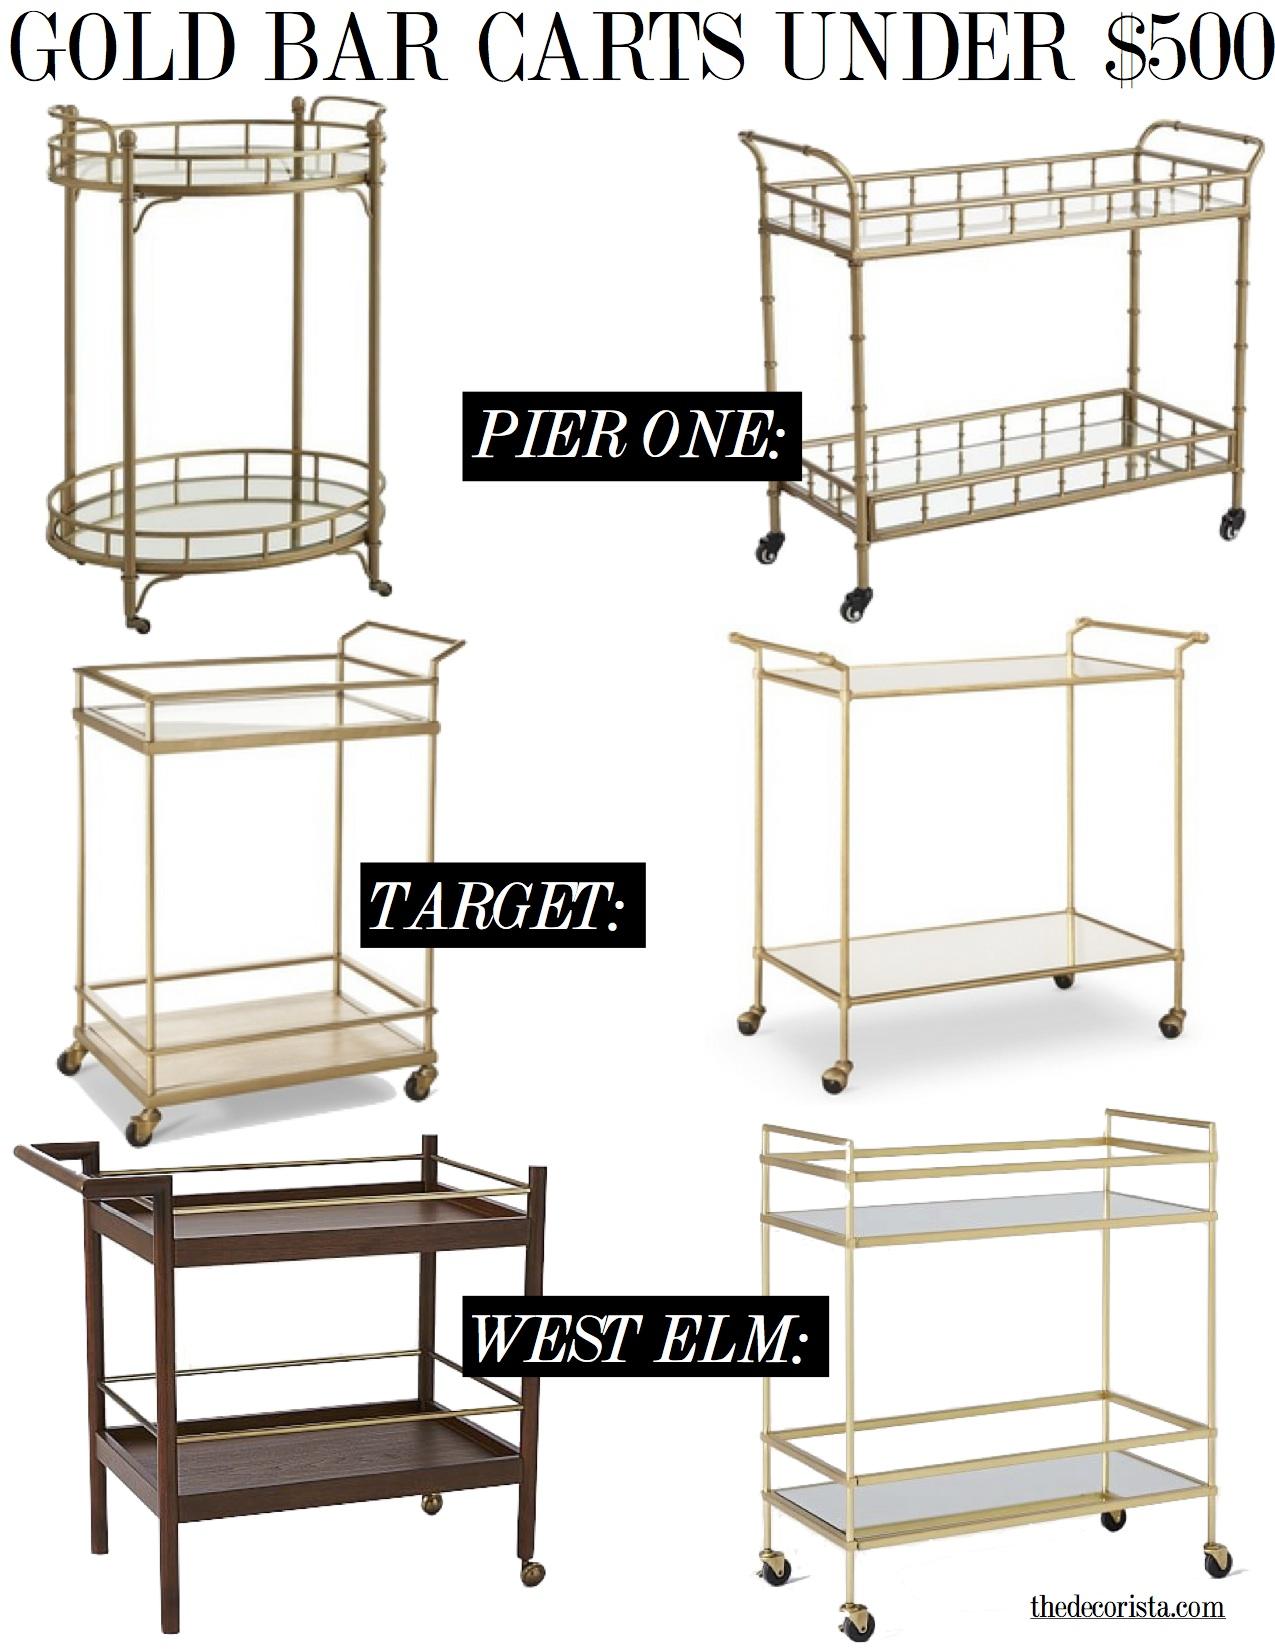 gold bar carts under $500 -the decorista